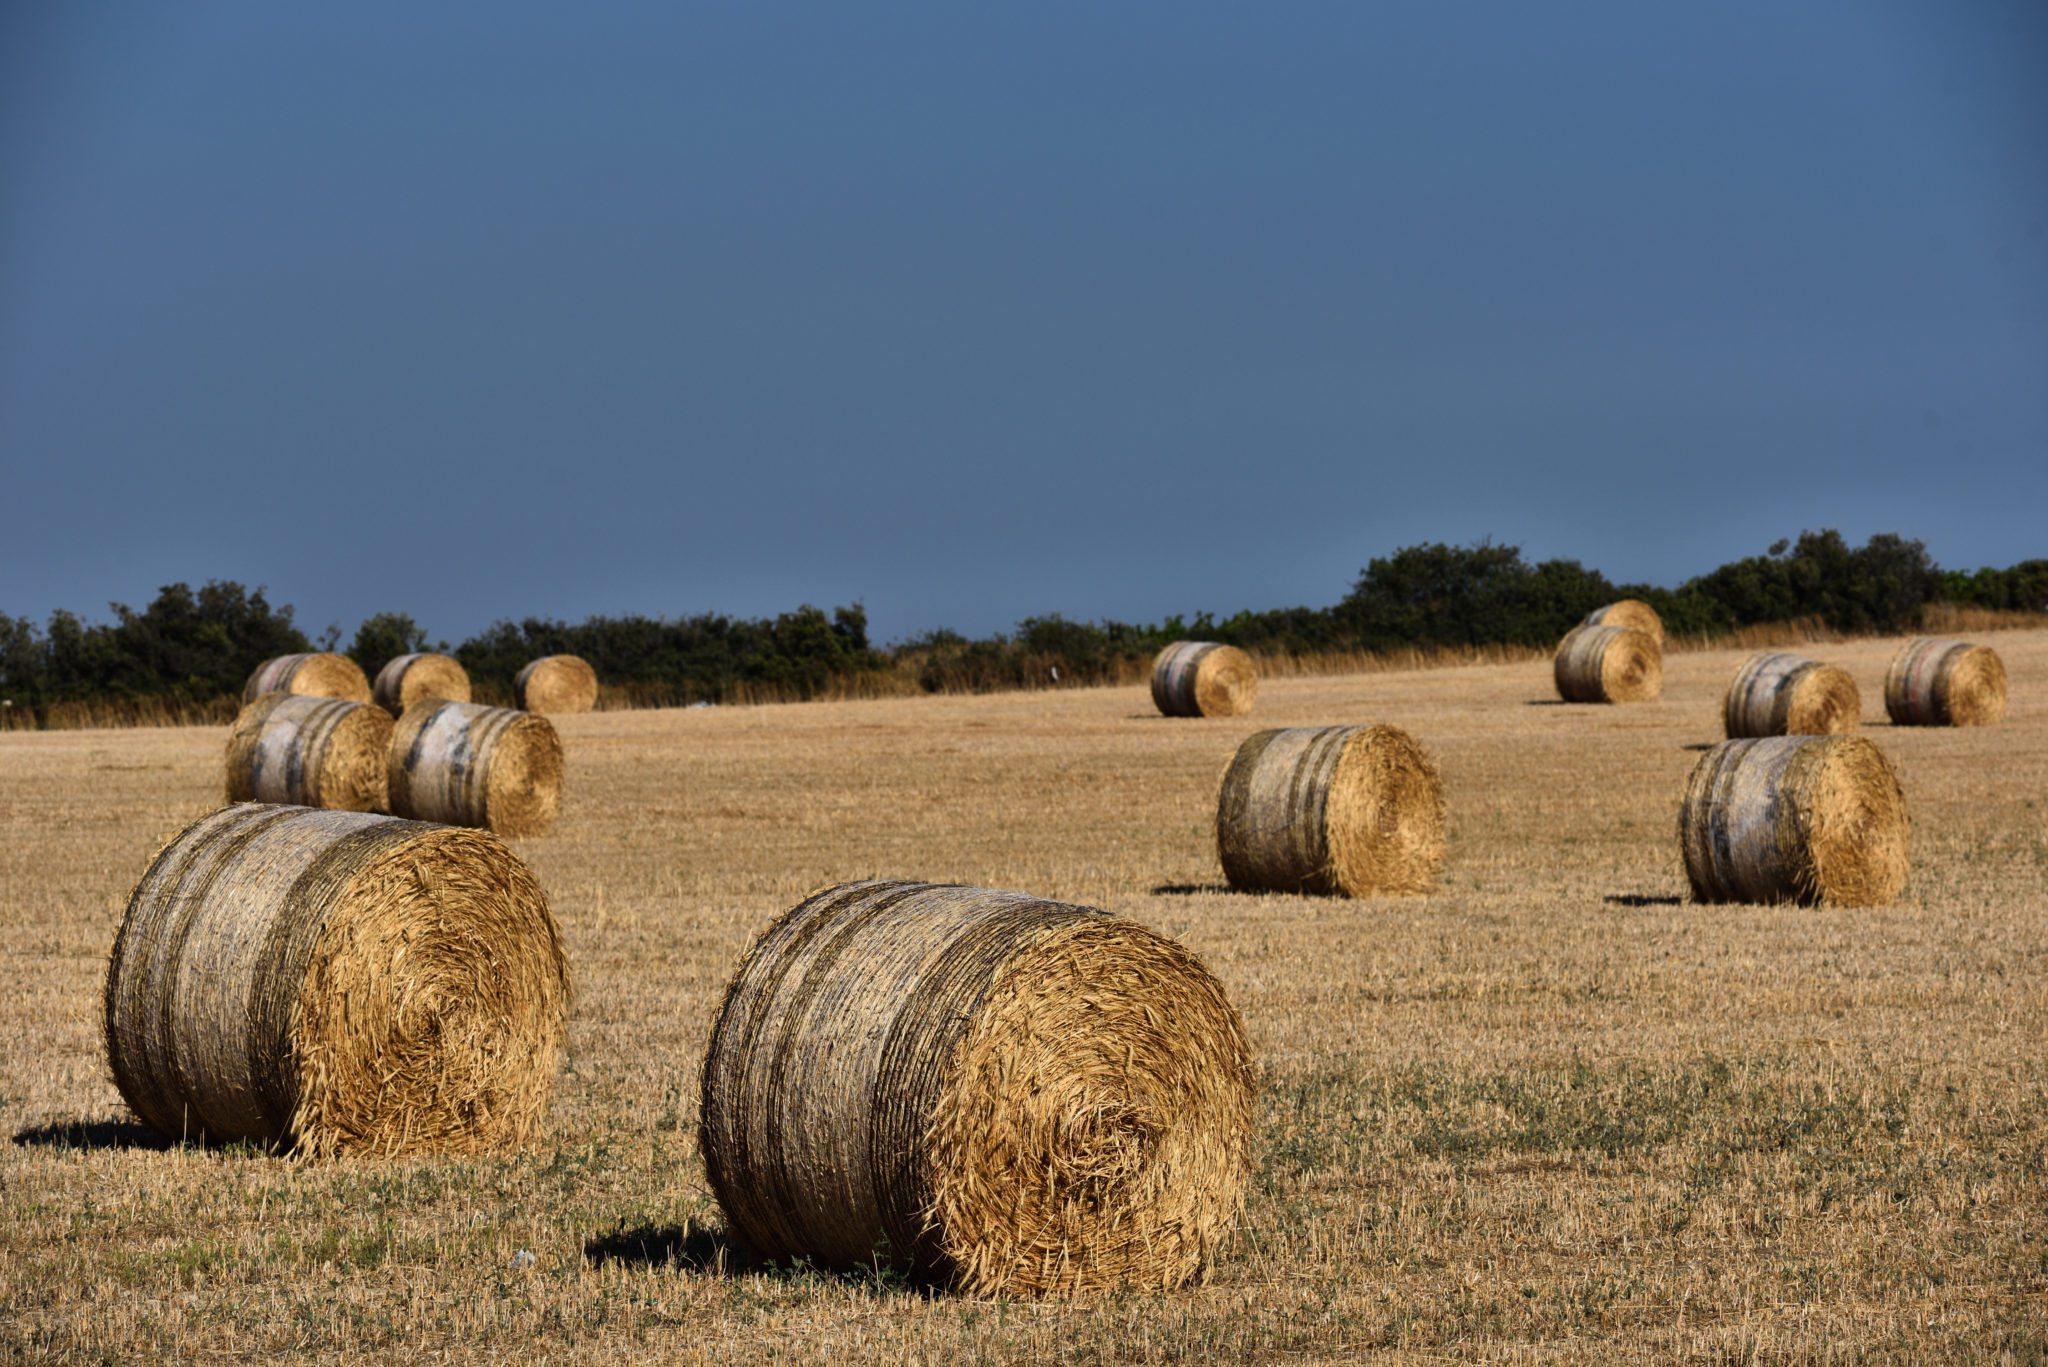 Straw bales, haystack on agricultural farmland against blue sky